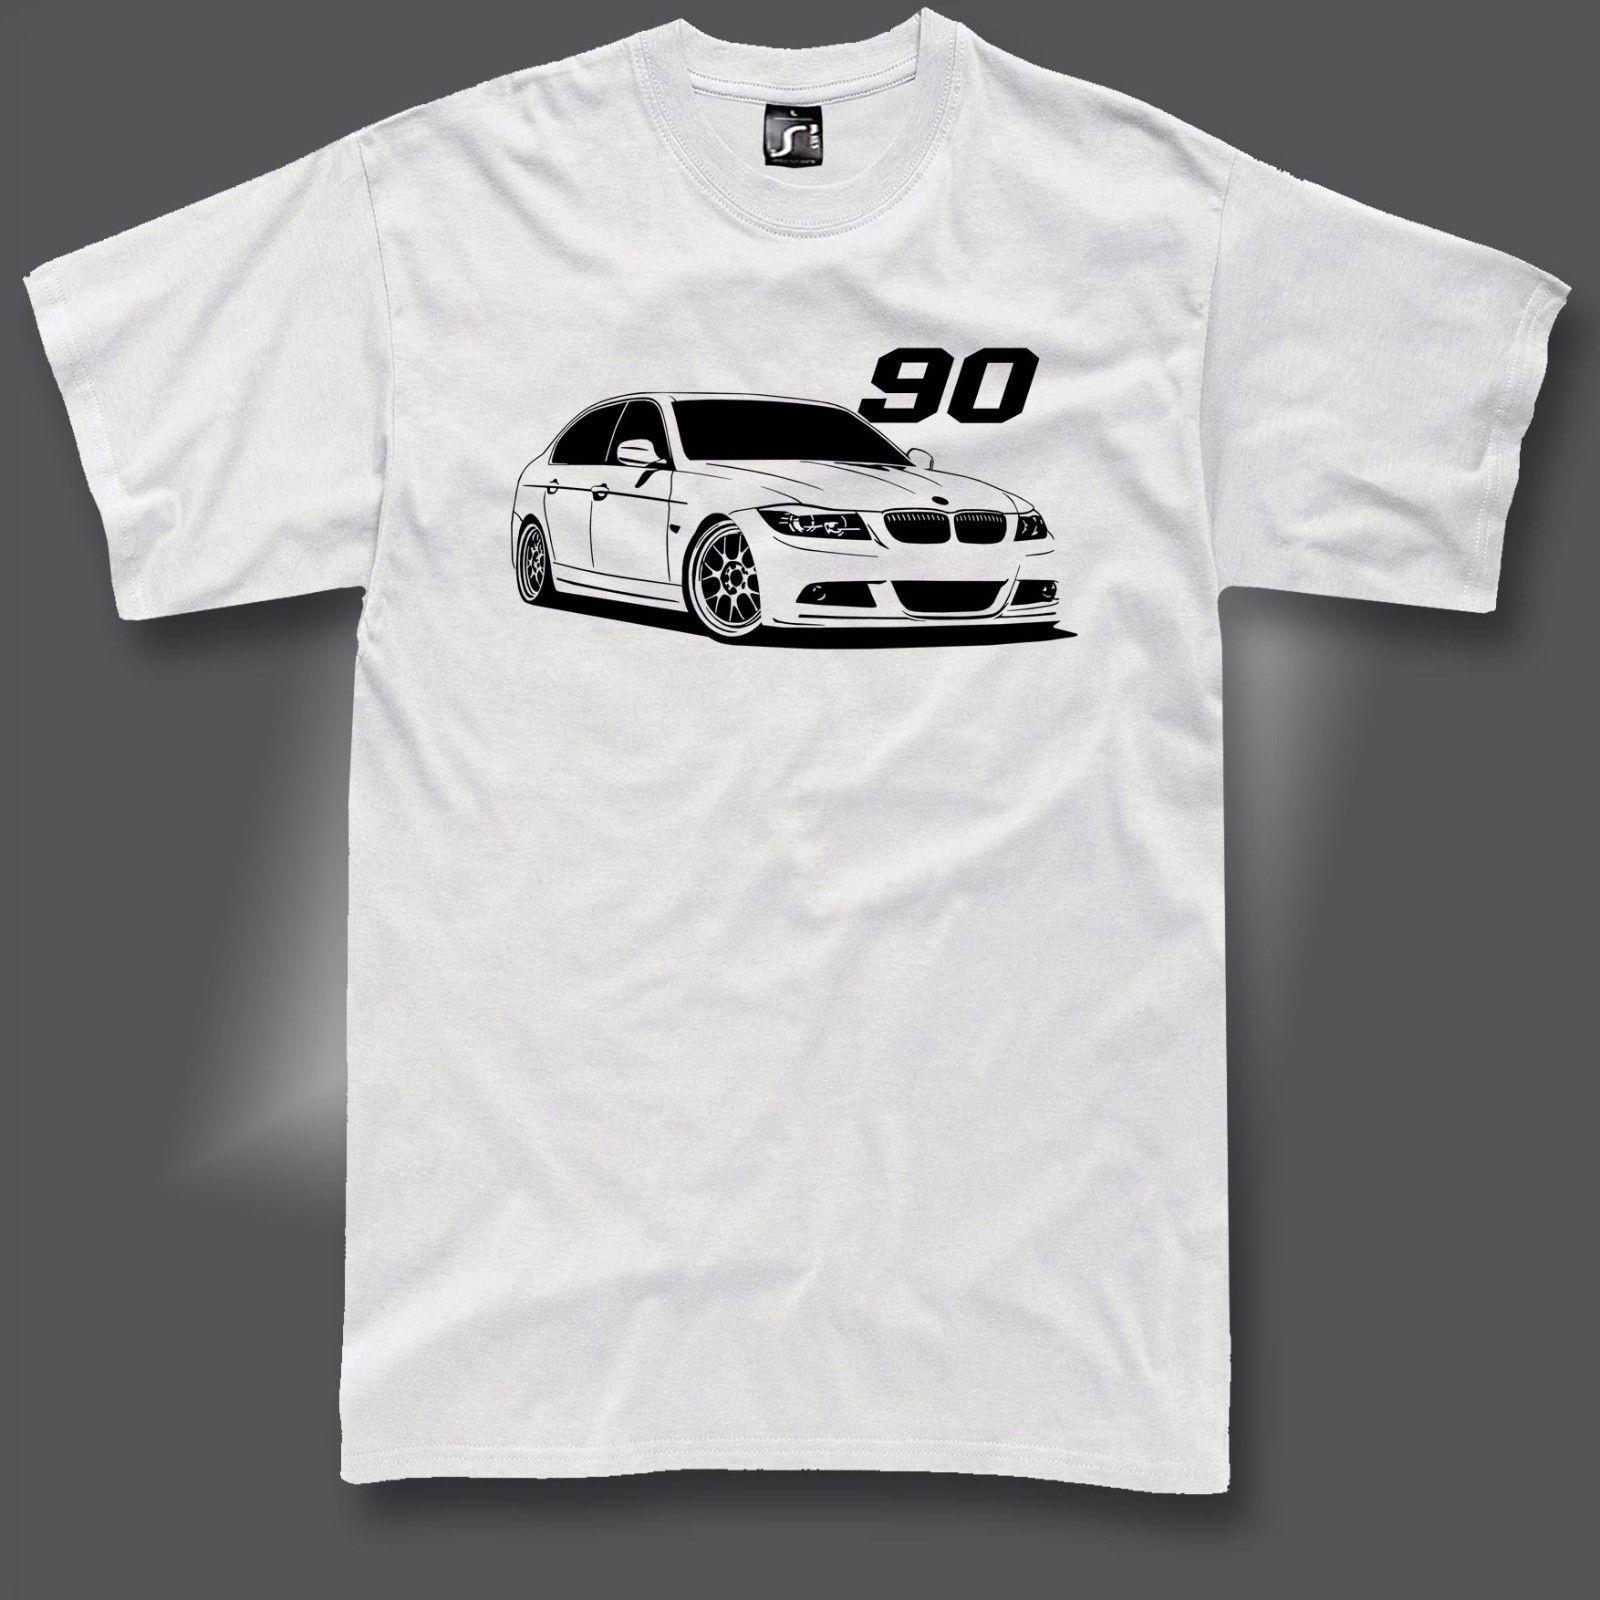 T Shirt For Bmw E90 Fans M3 330i 325i 328i 335i S 5xl Shirts T Shirt Bmw